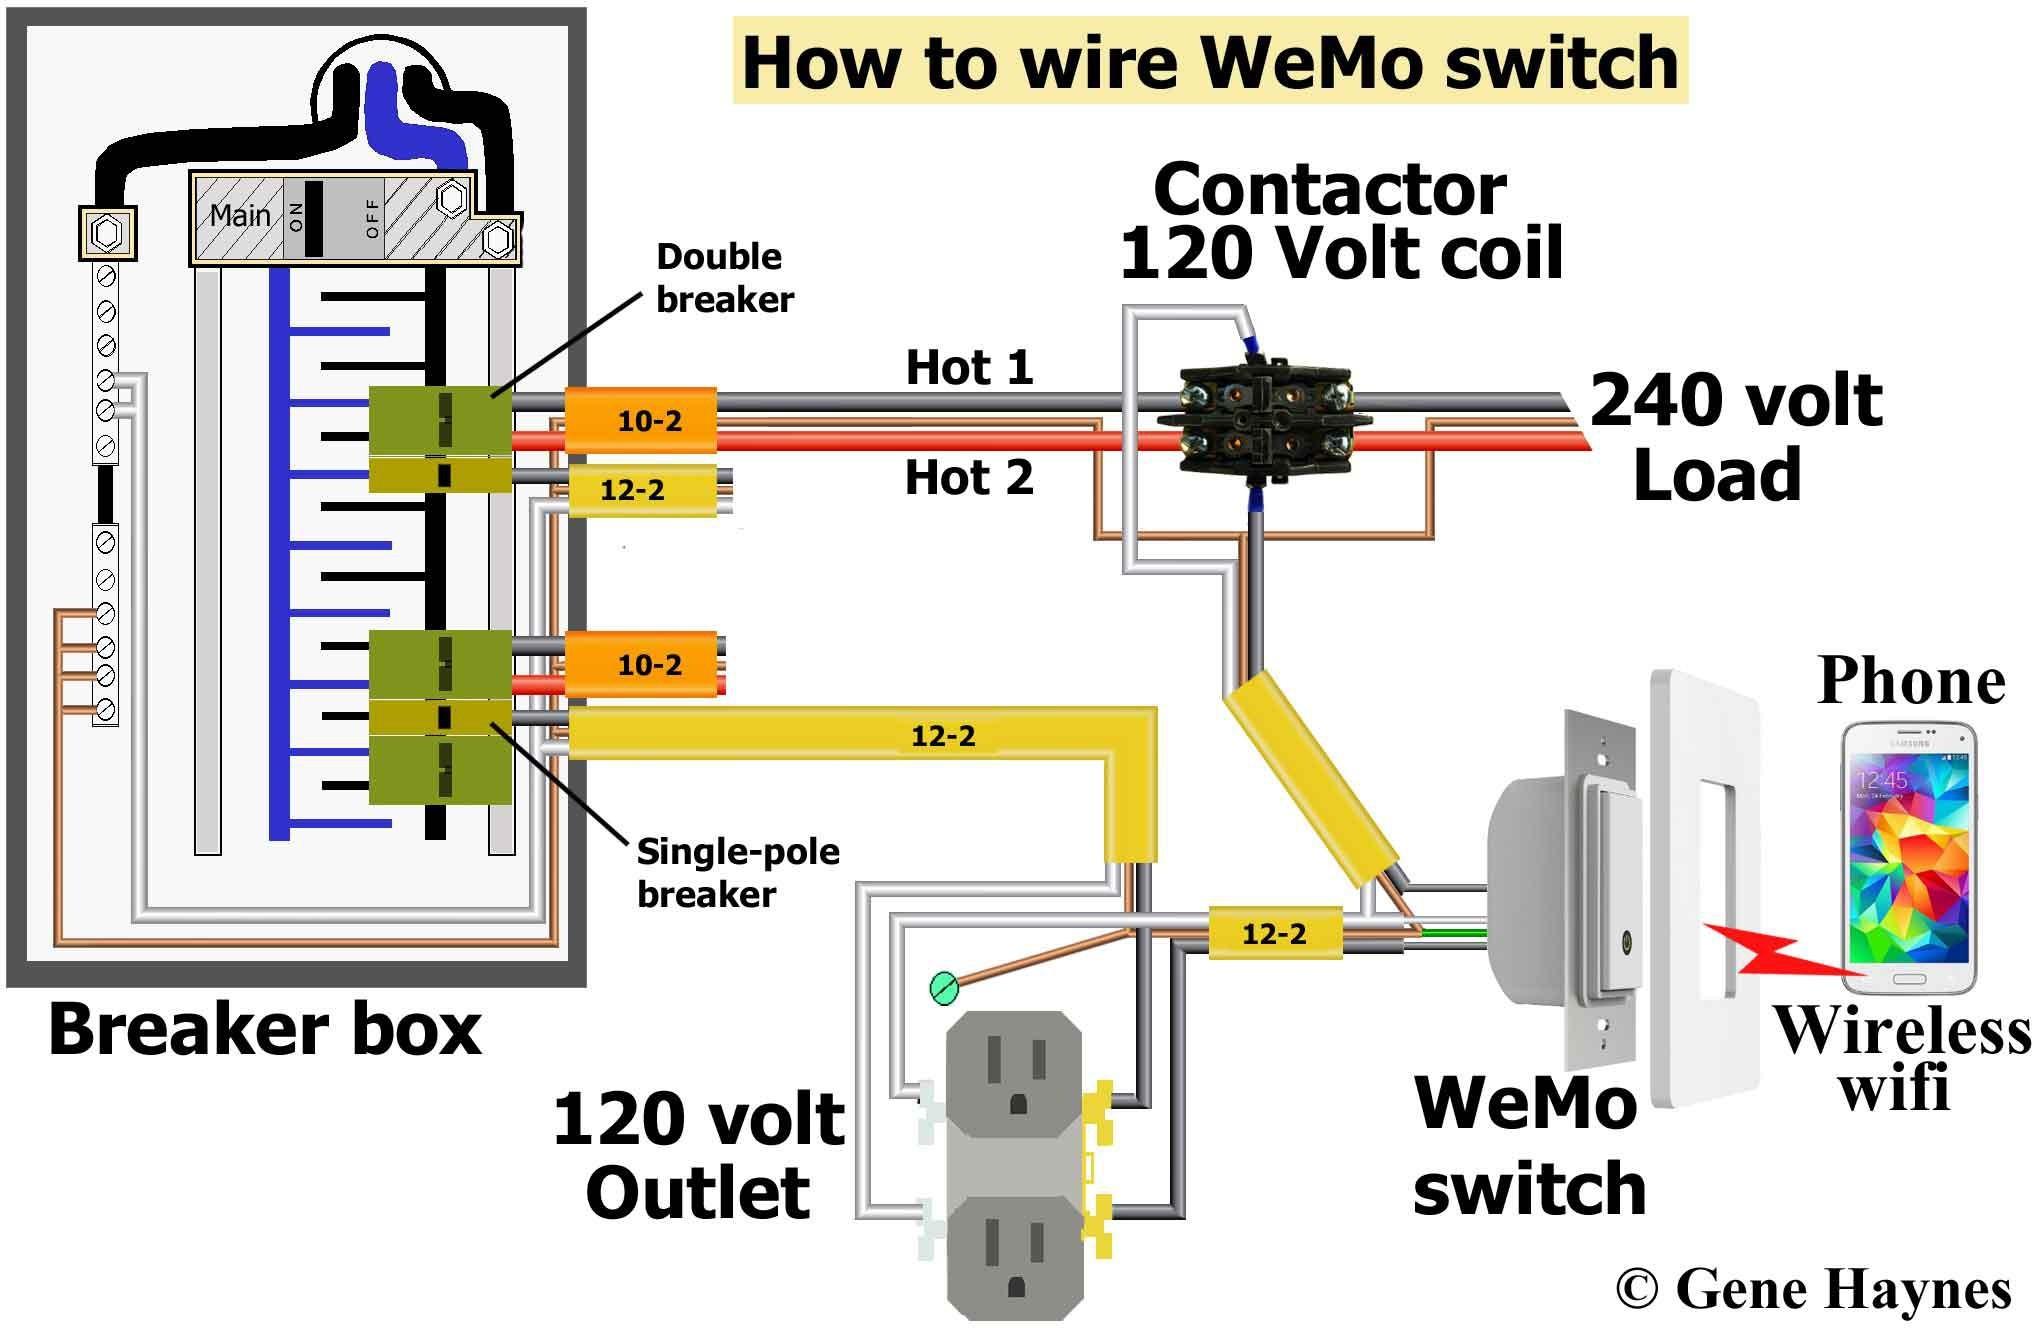 2 Pole Gfci Breaker Wiring Diagram Inspirational Gfci Breaker Diagram Wiring Data •